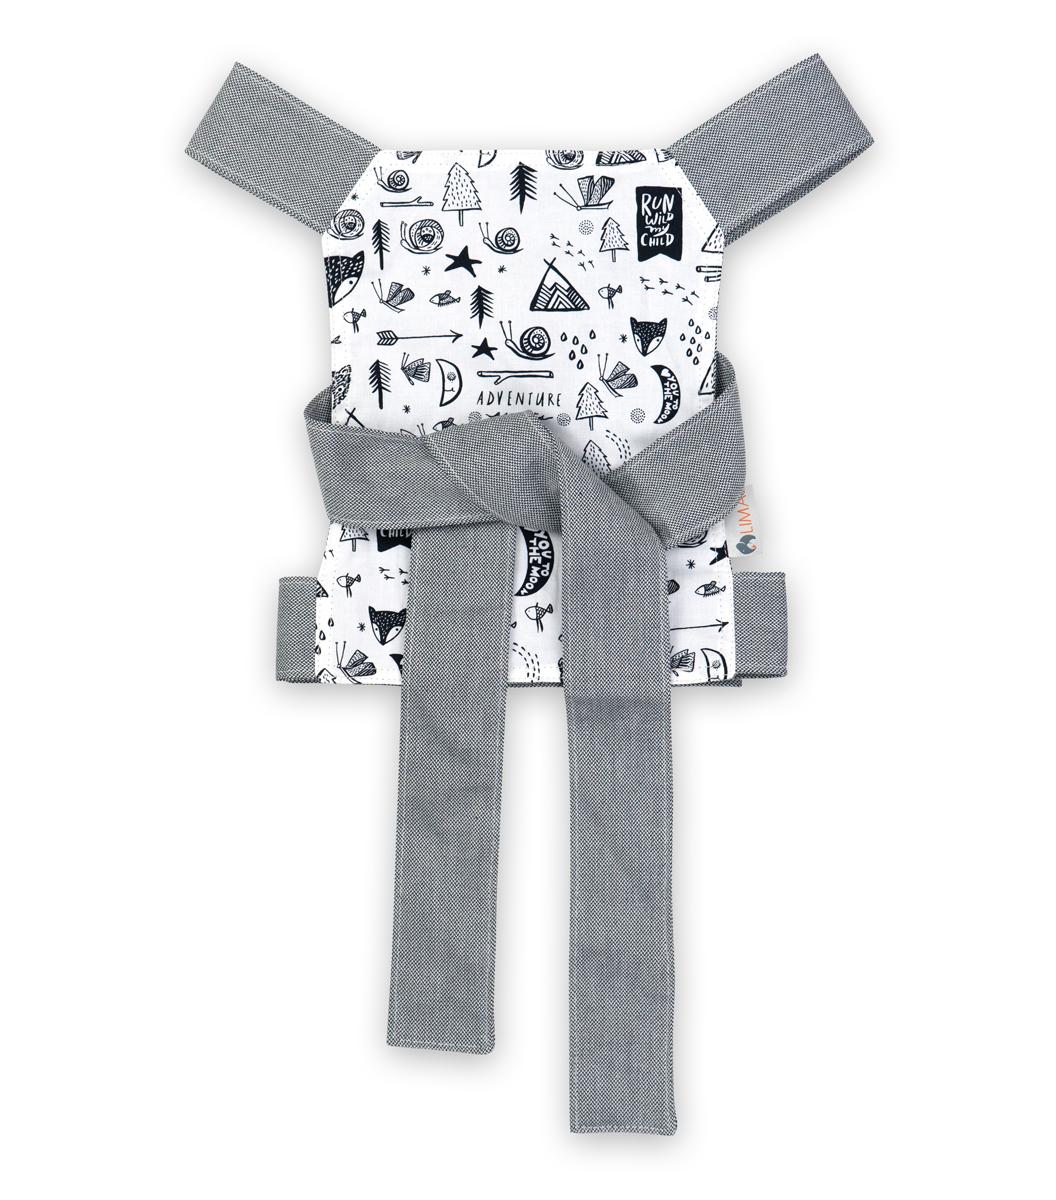 Limas Puppentrage, versch. Designs